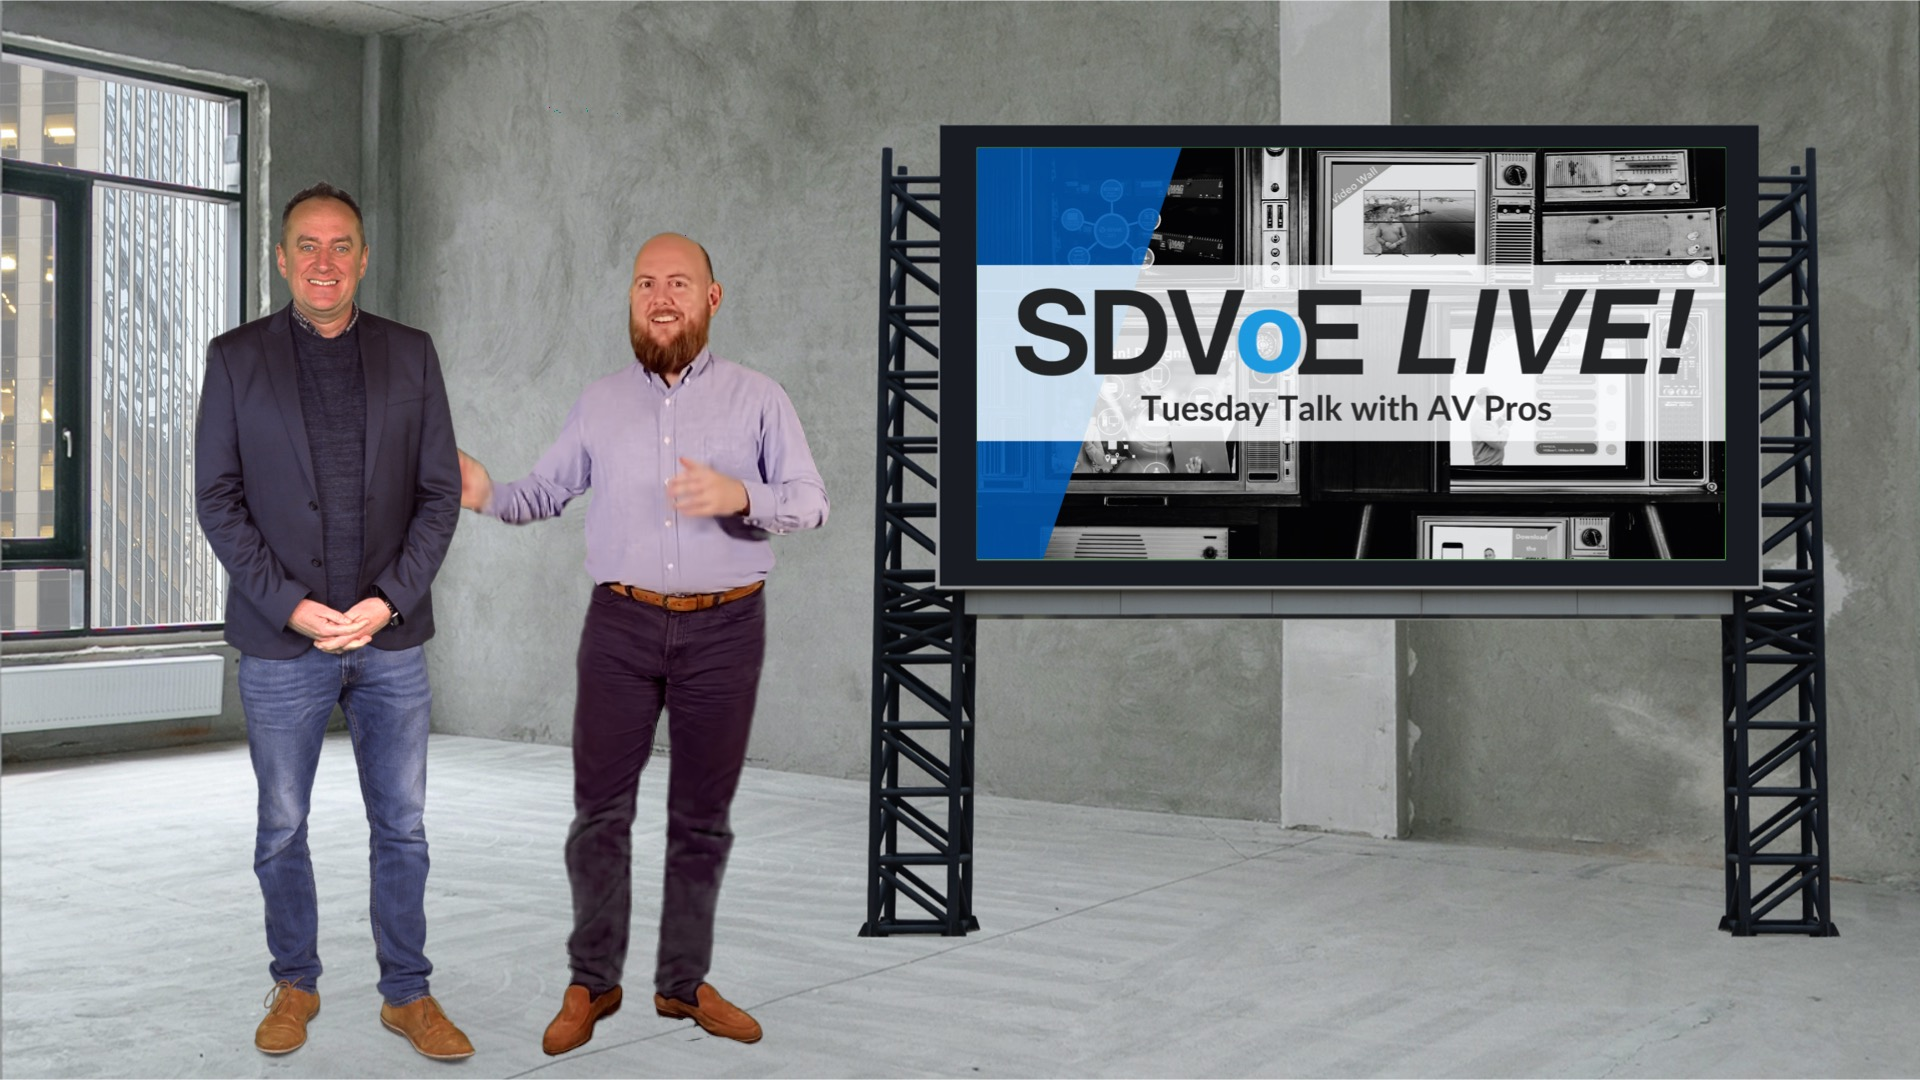 SDVoE LIVE! Episode 5: The 8K Revolution in Pro AV